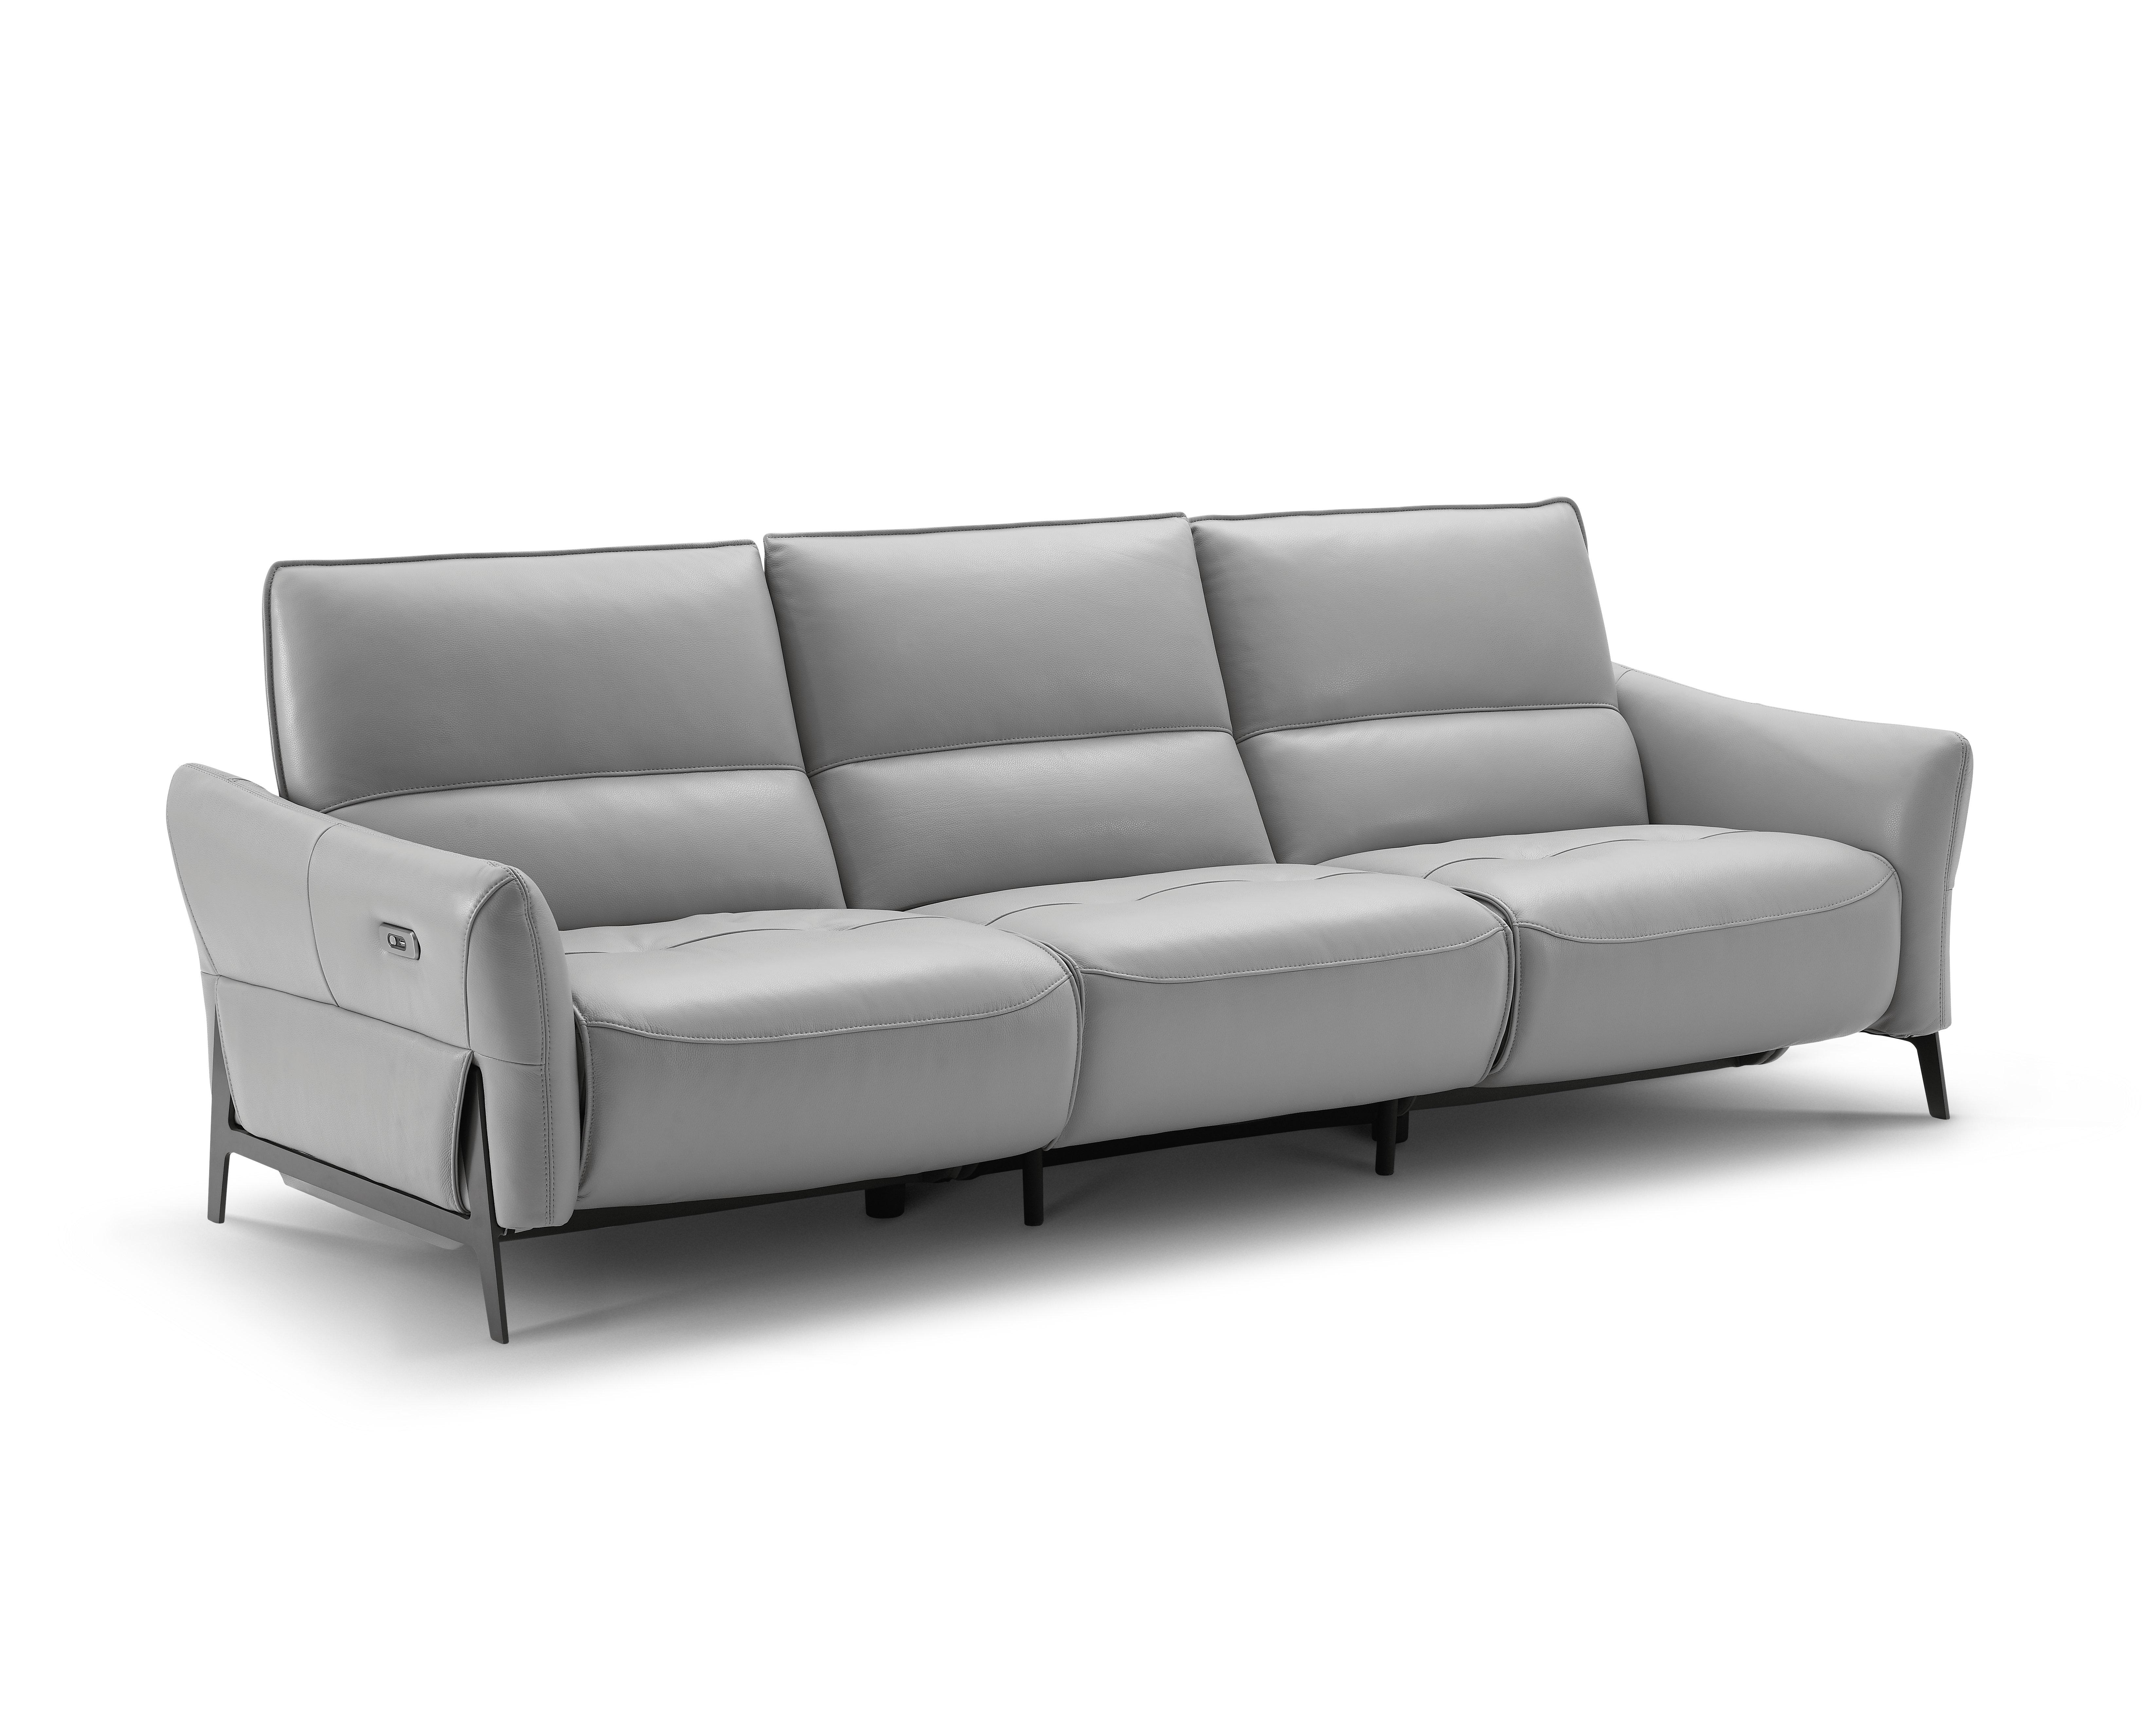 Incredible Orren Ellis Branchdale Leather Reclining Sofa Wayfair Ca Ncnpc Chair Design For Home Ncnpcorg